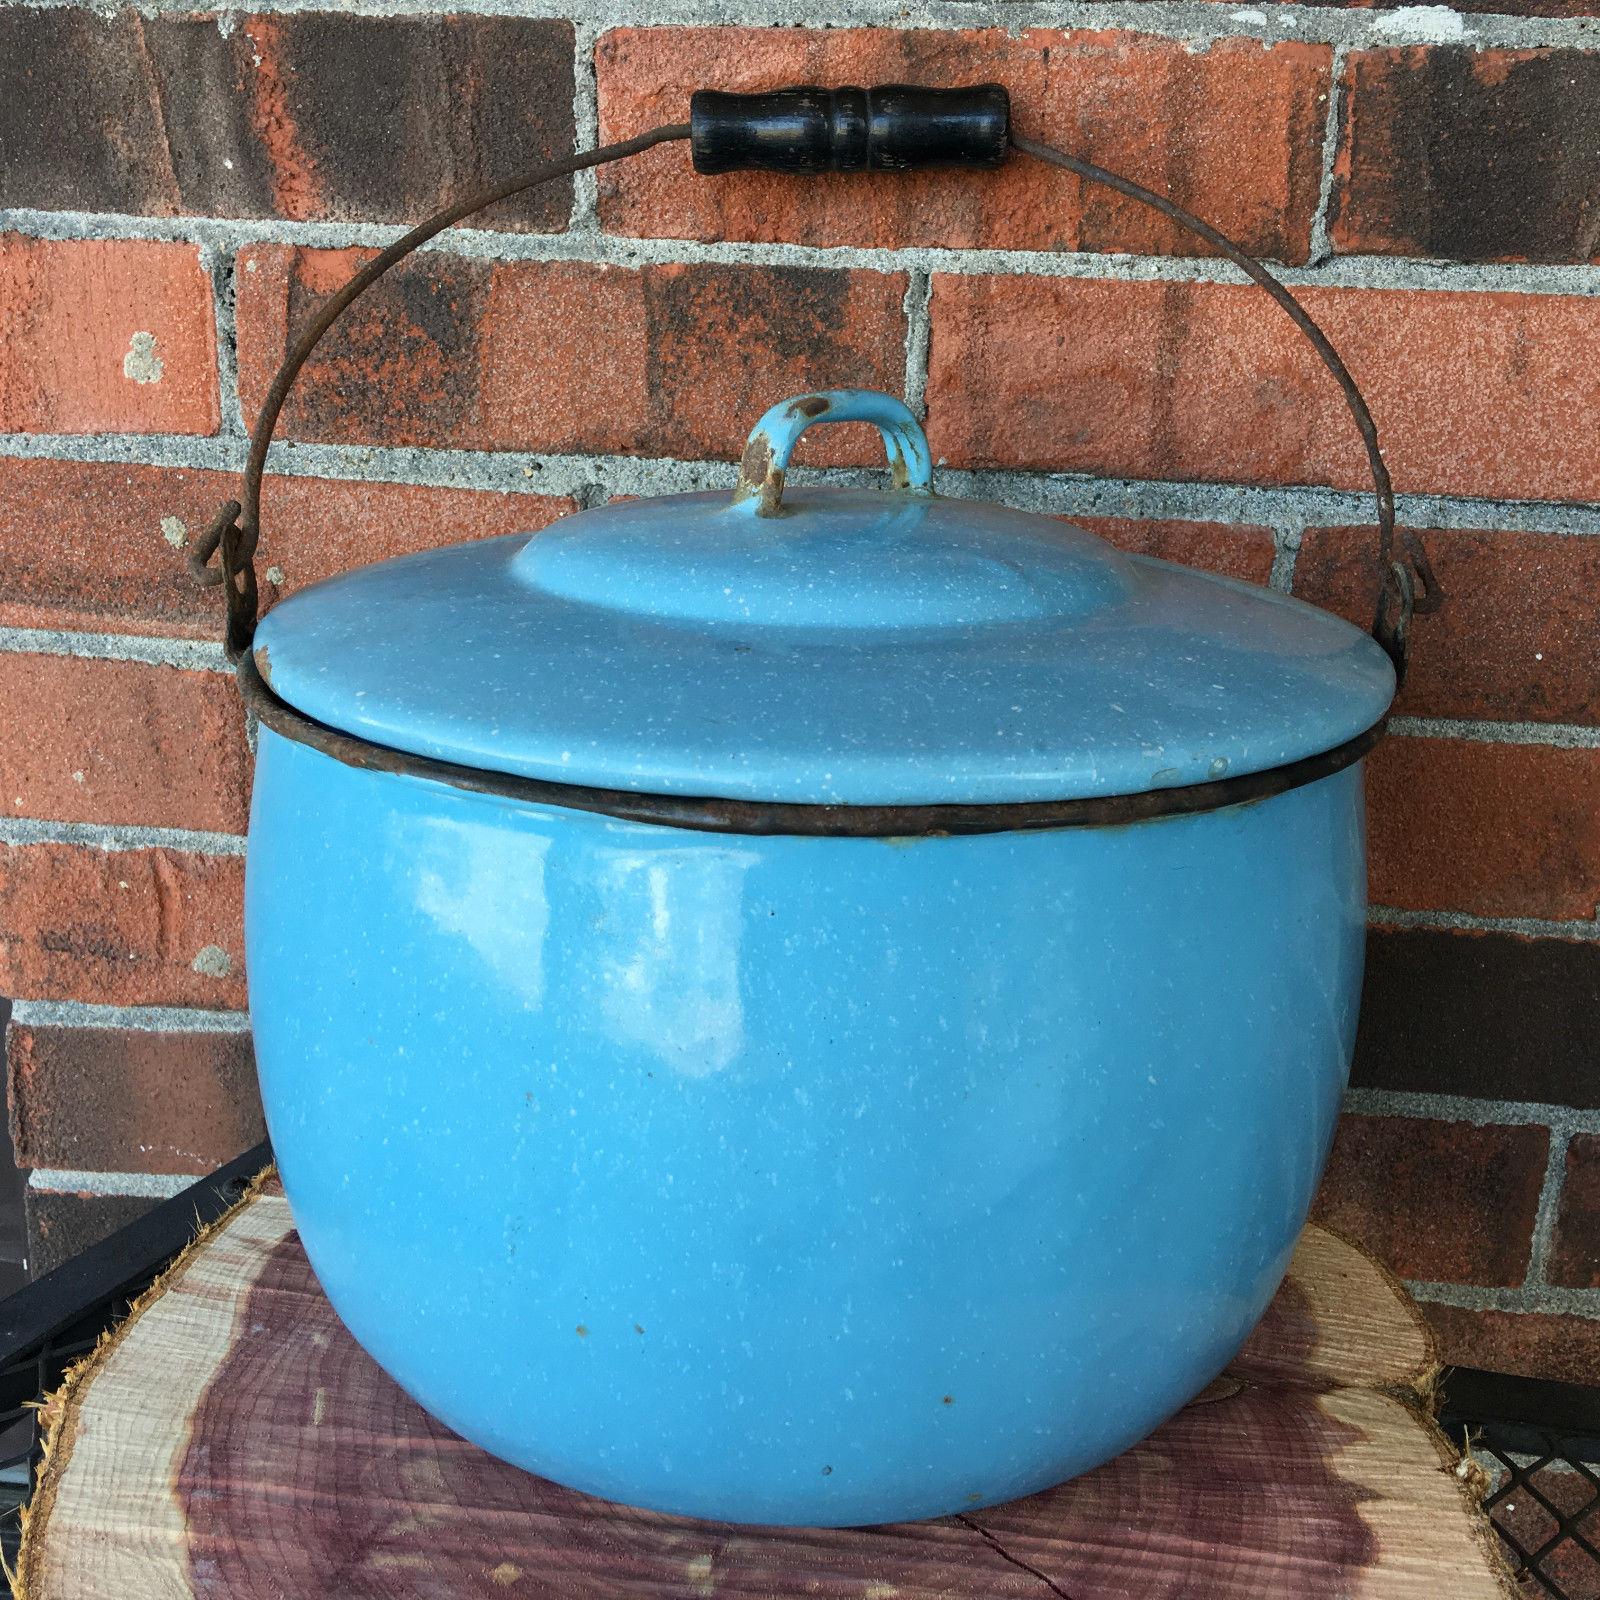 "VTG Enamelware Pail Kettle Blue Stock Pot Lid Wood Handle 10"" Estate camping"